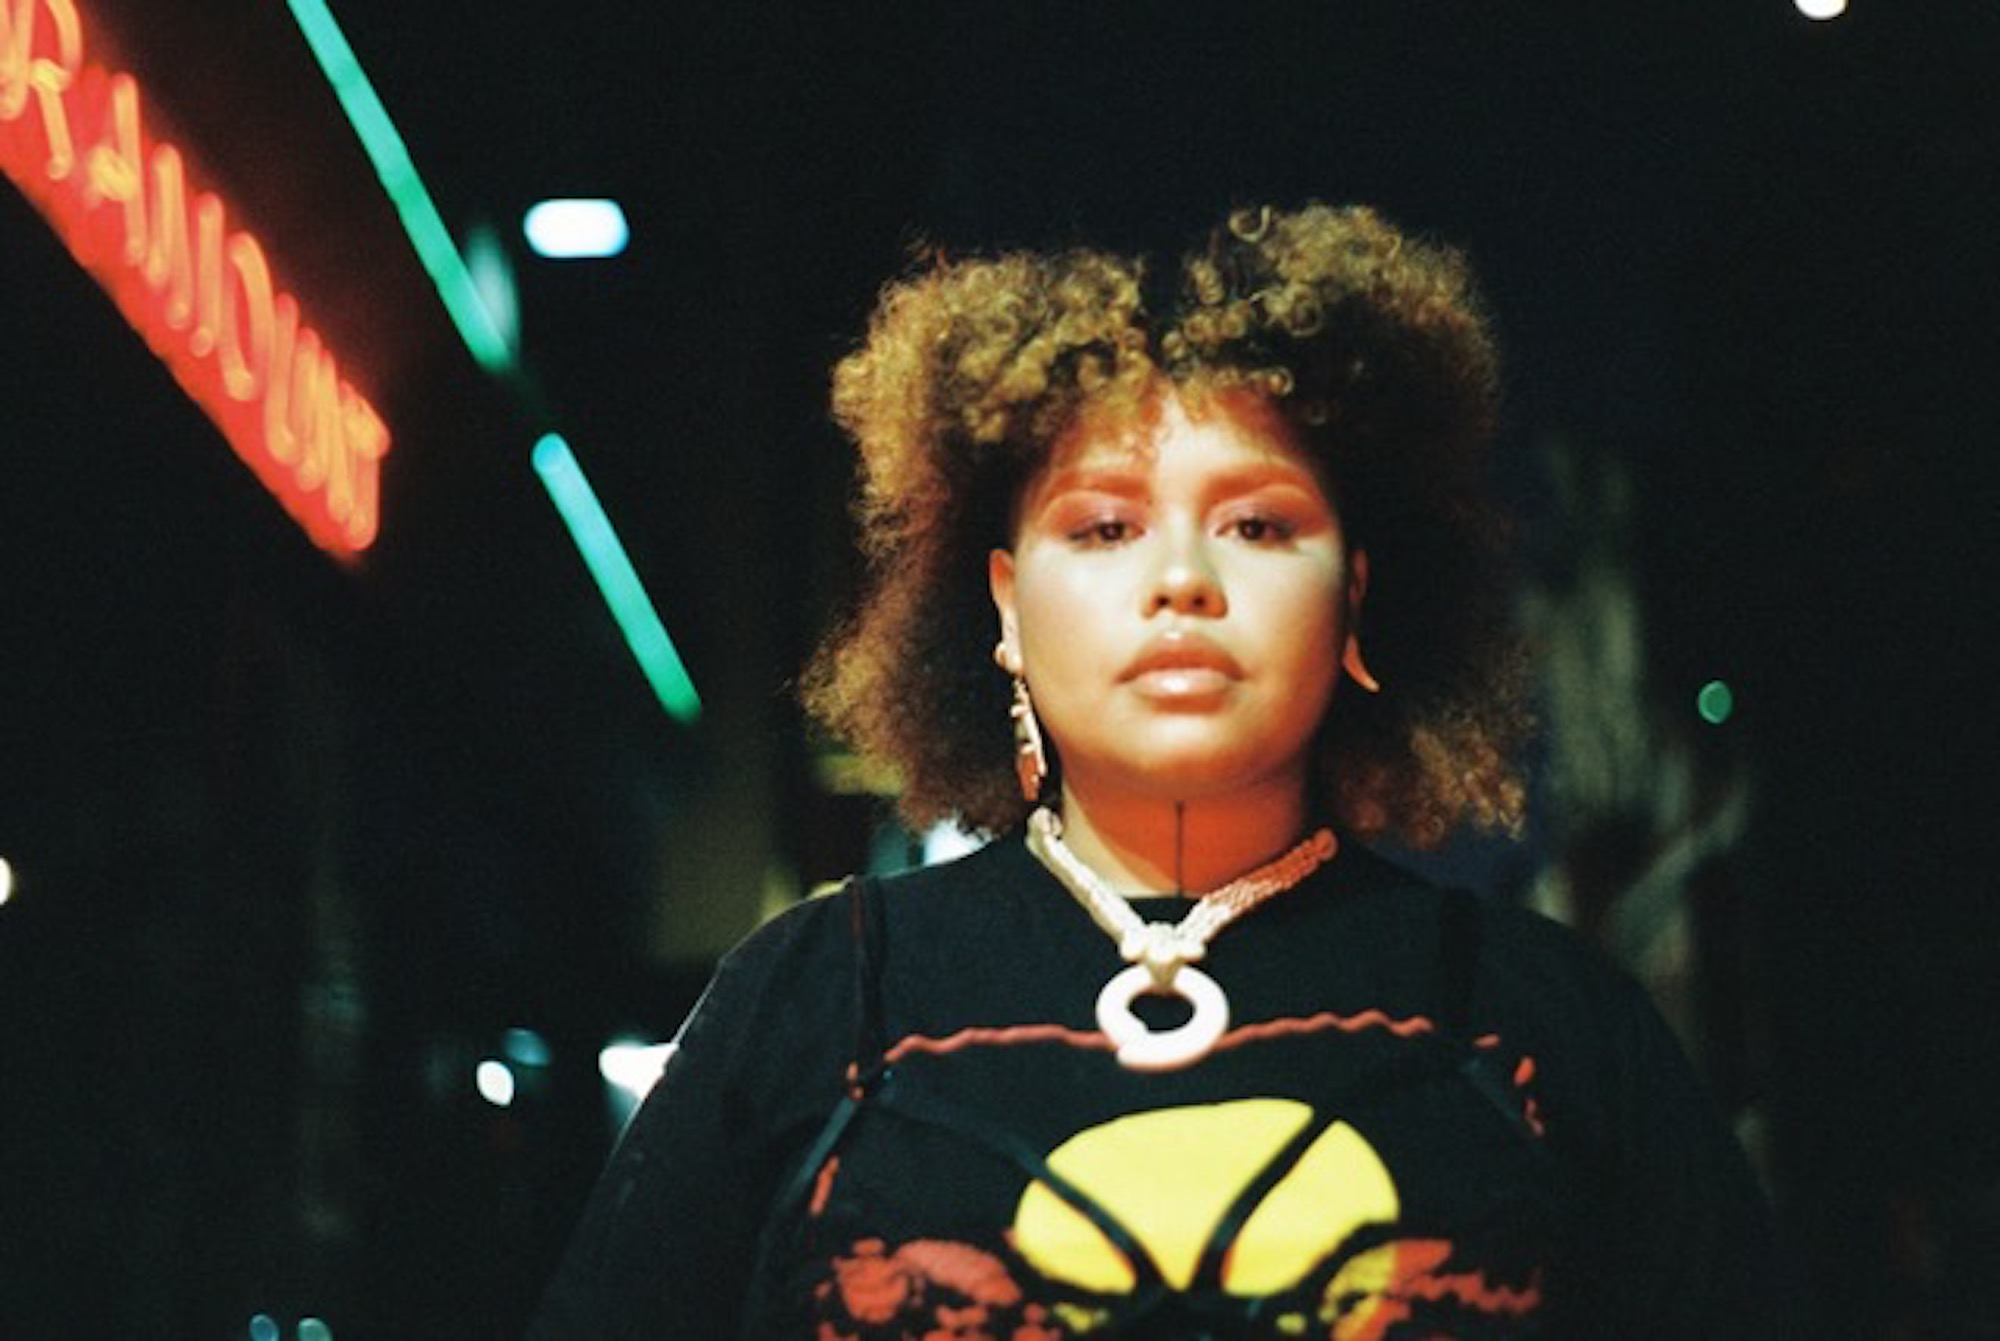 Australian Neo-Soul Singer Kaiit Premieres